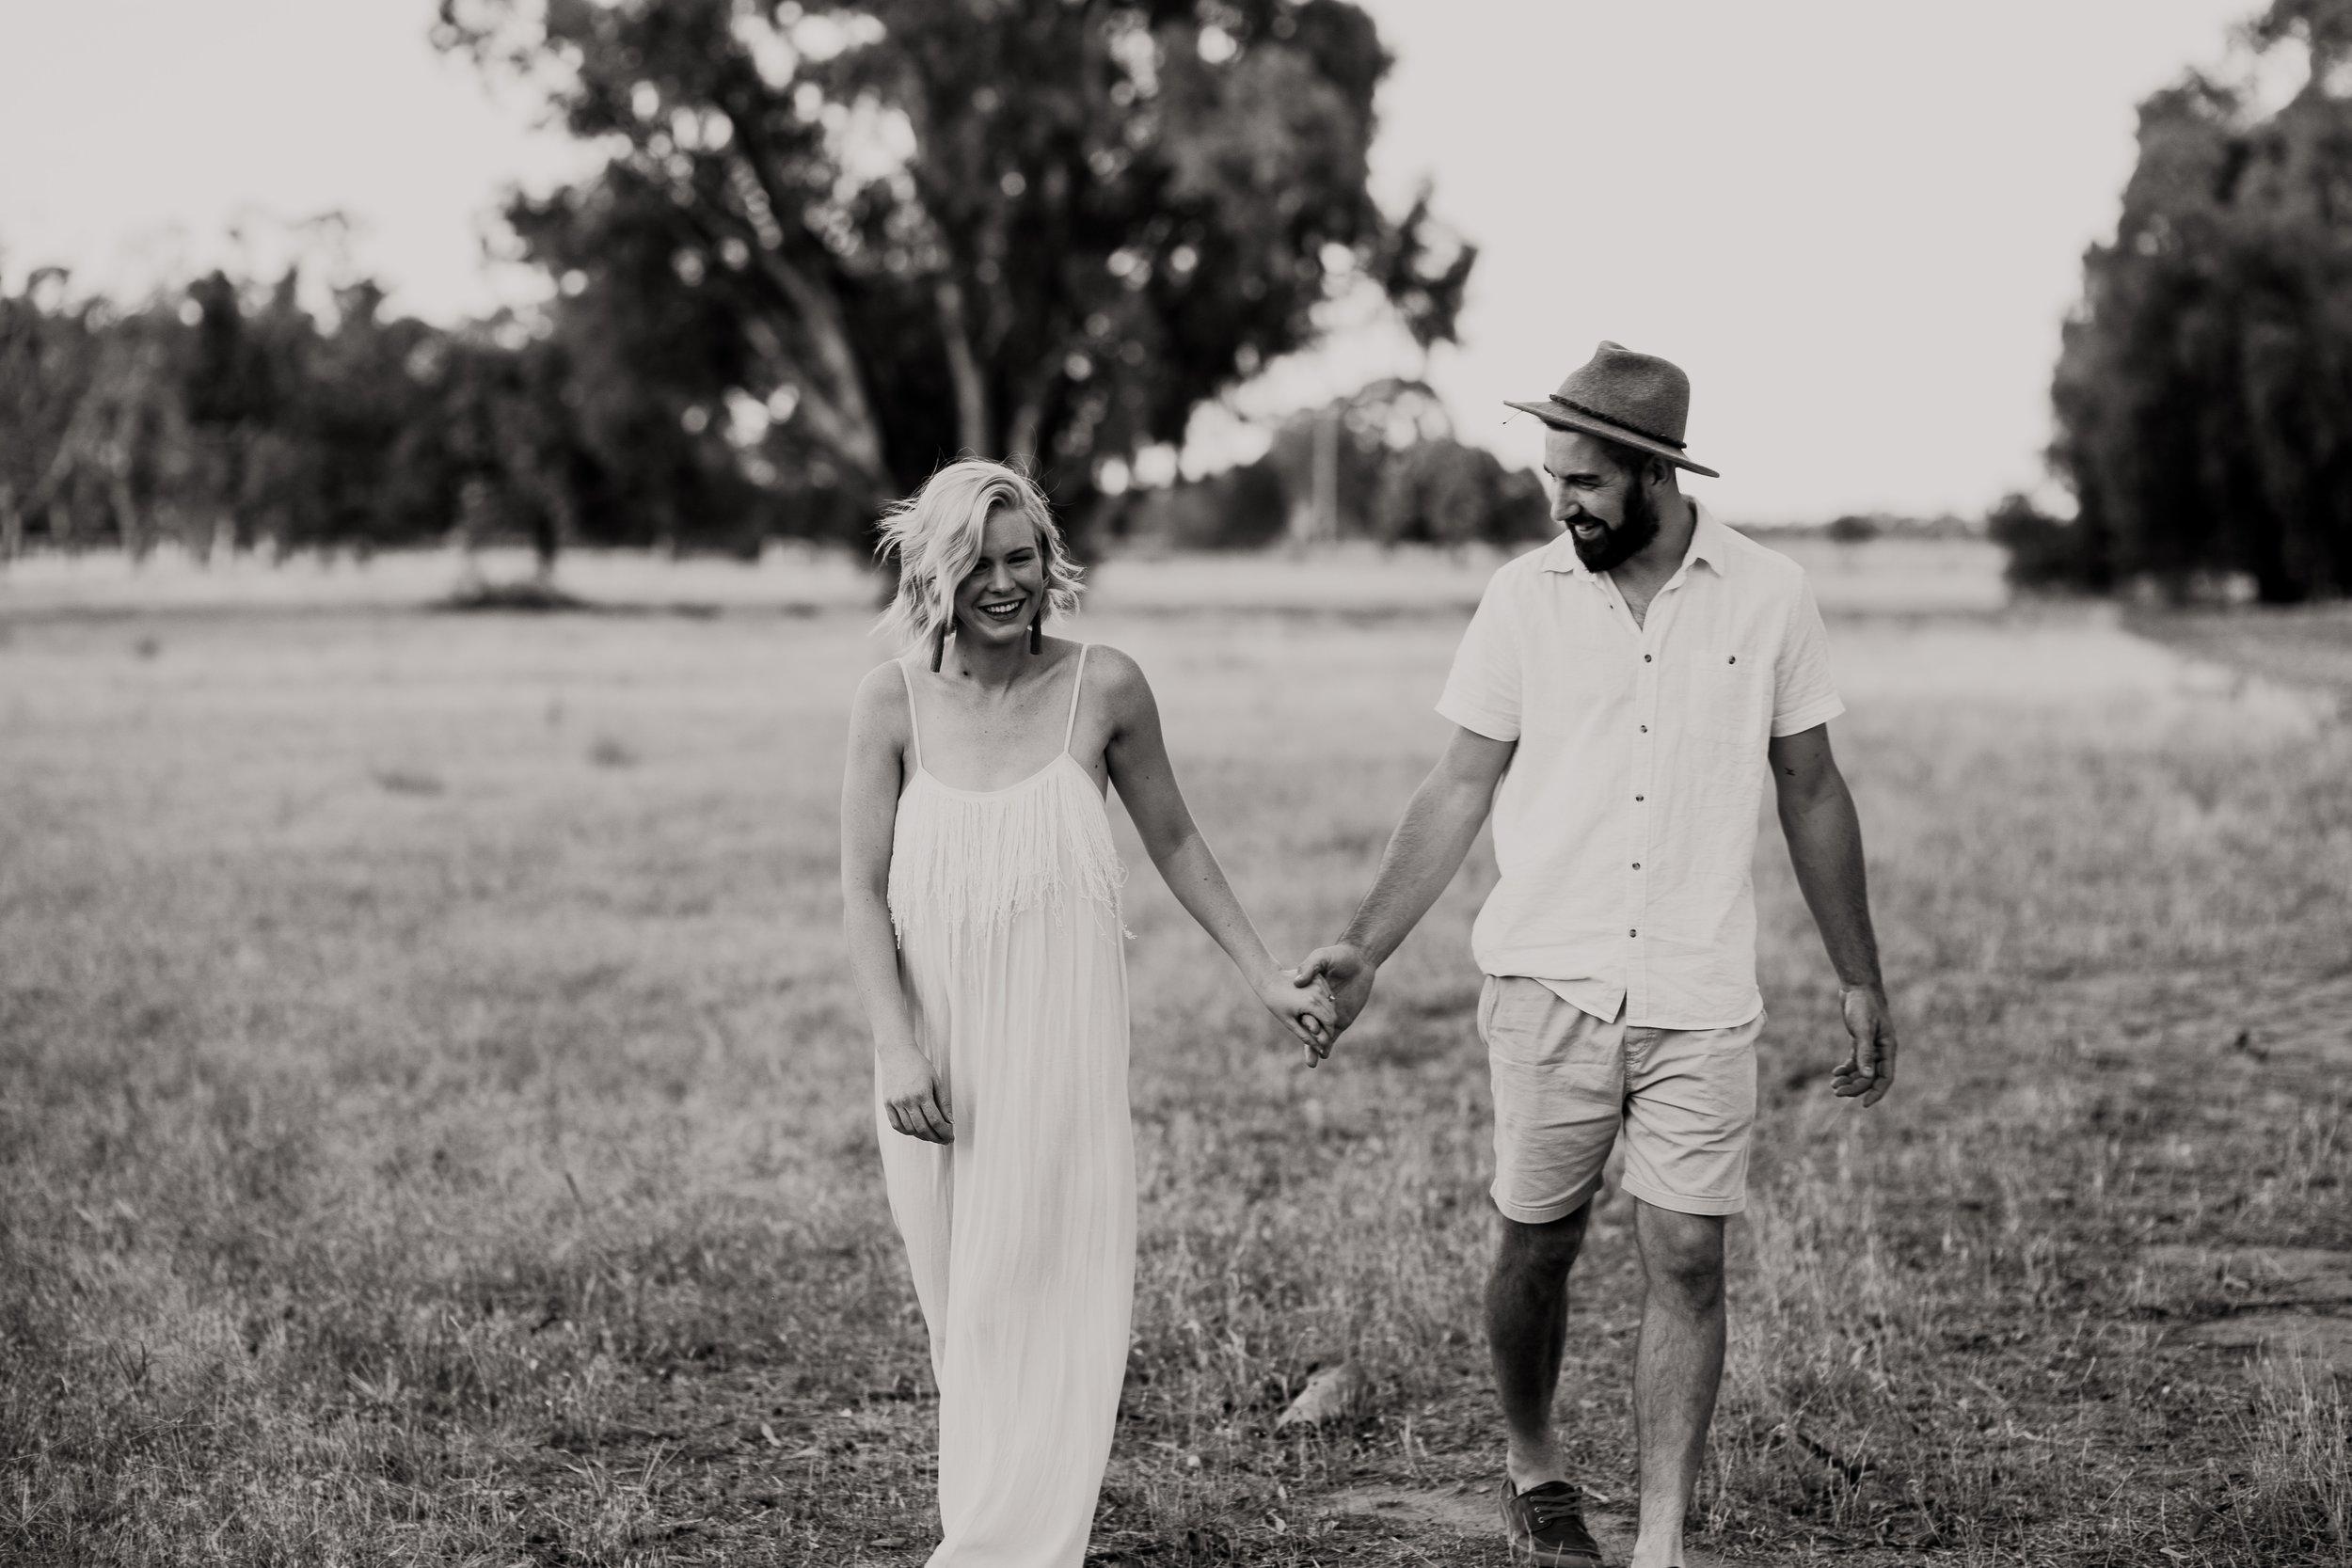 mickalathomas_puremacphotography_weddingphotographer_couplephotographer_Sheppartonphotographer_1635.jpg